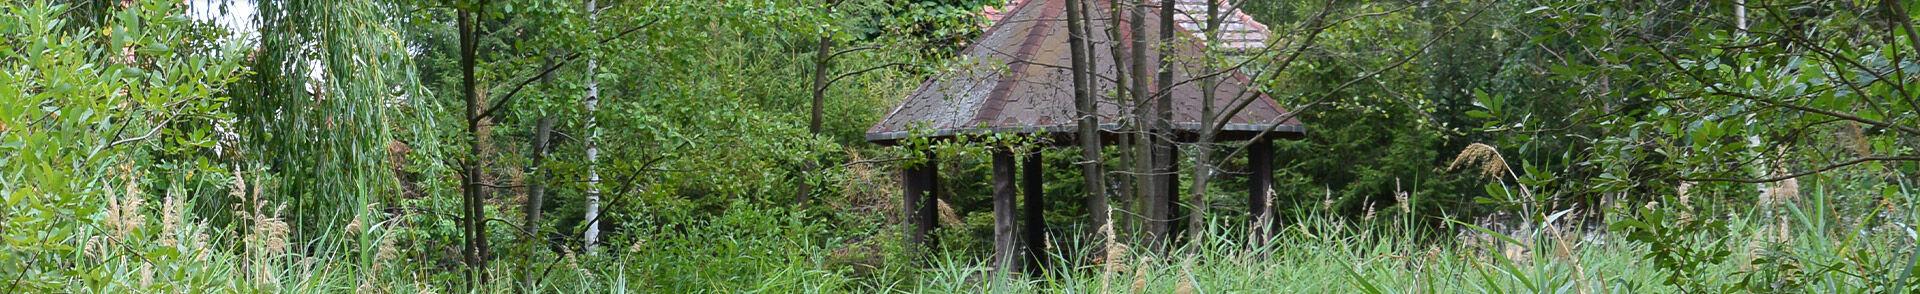 Biotop am Forsthaus Mühlrose